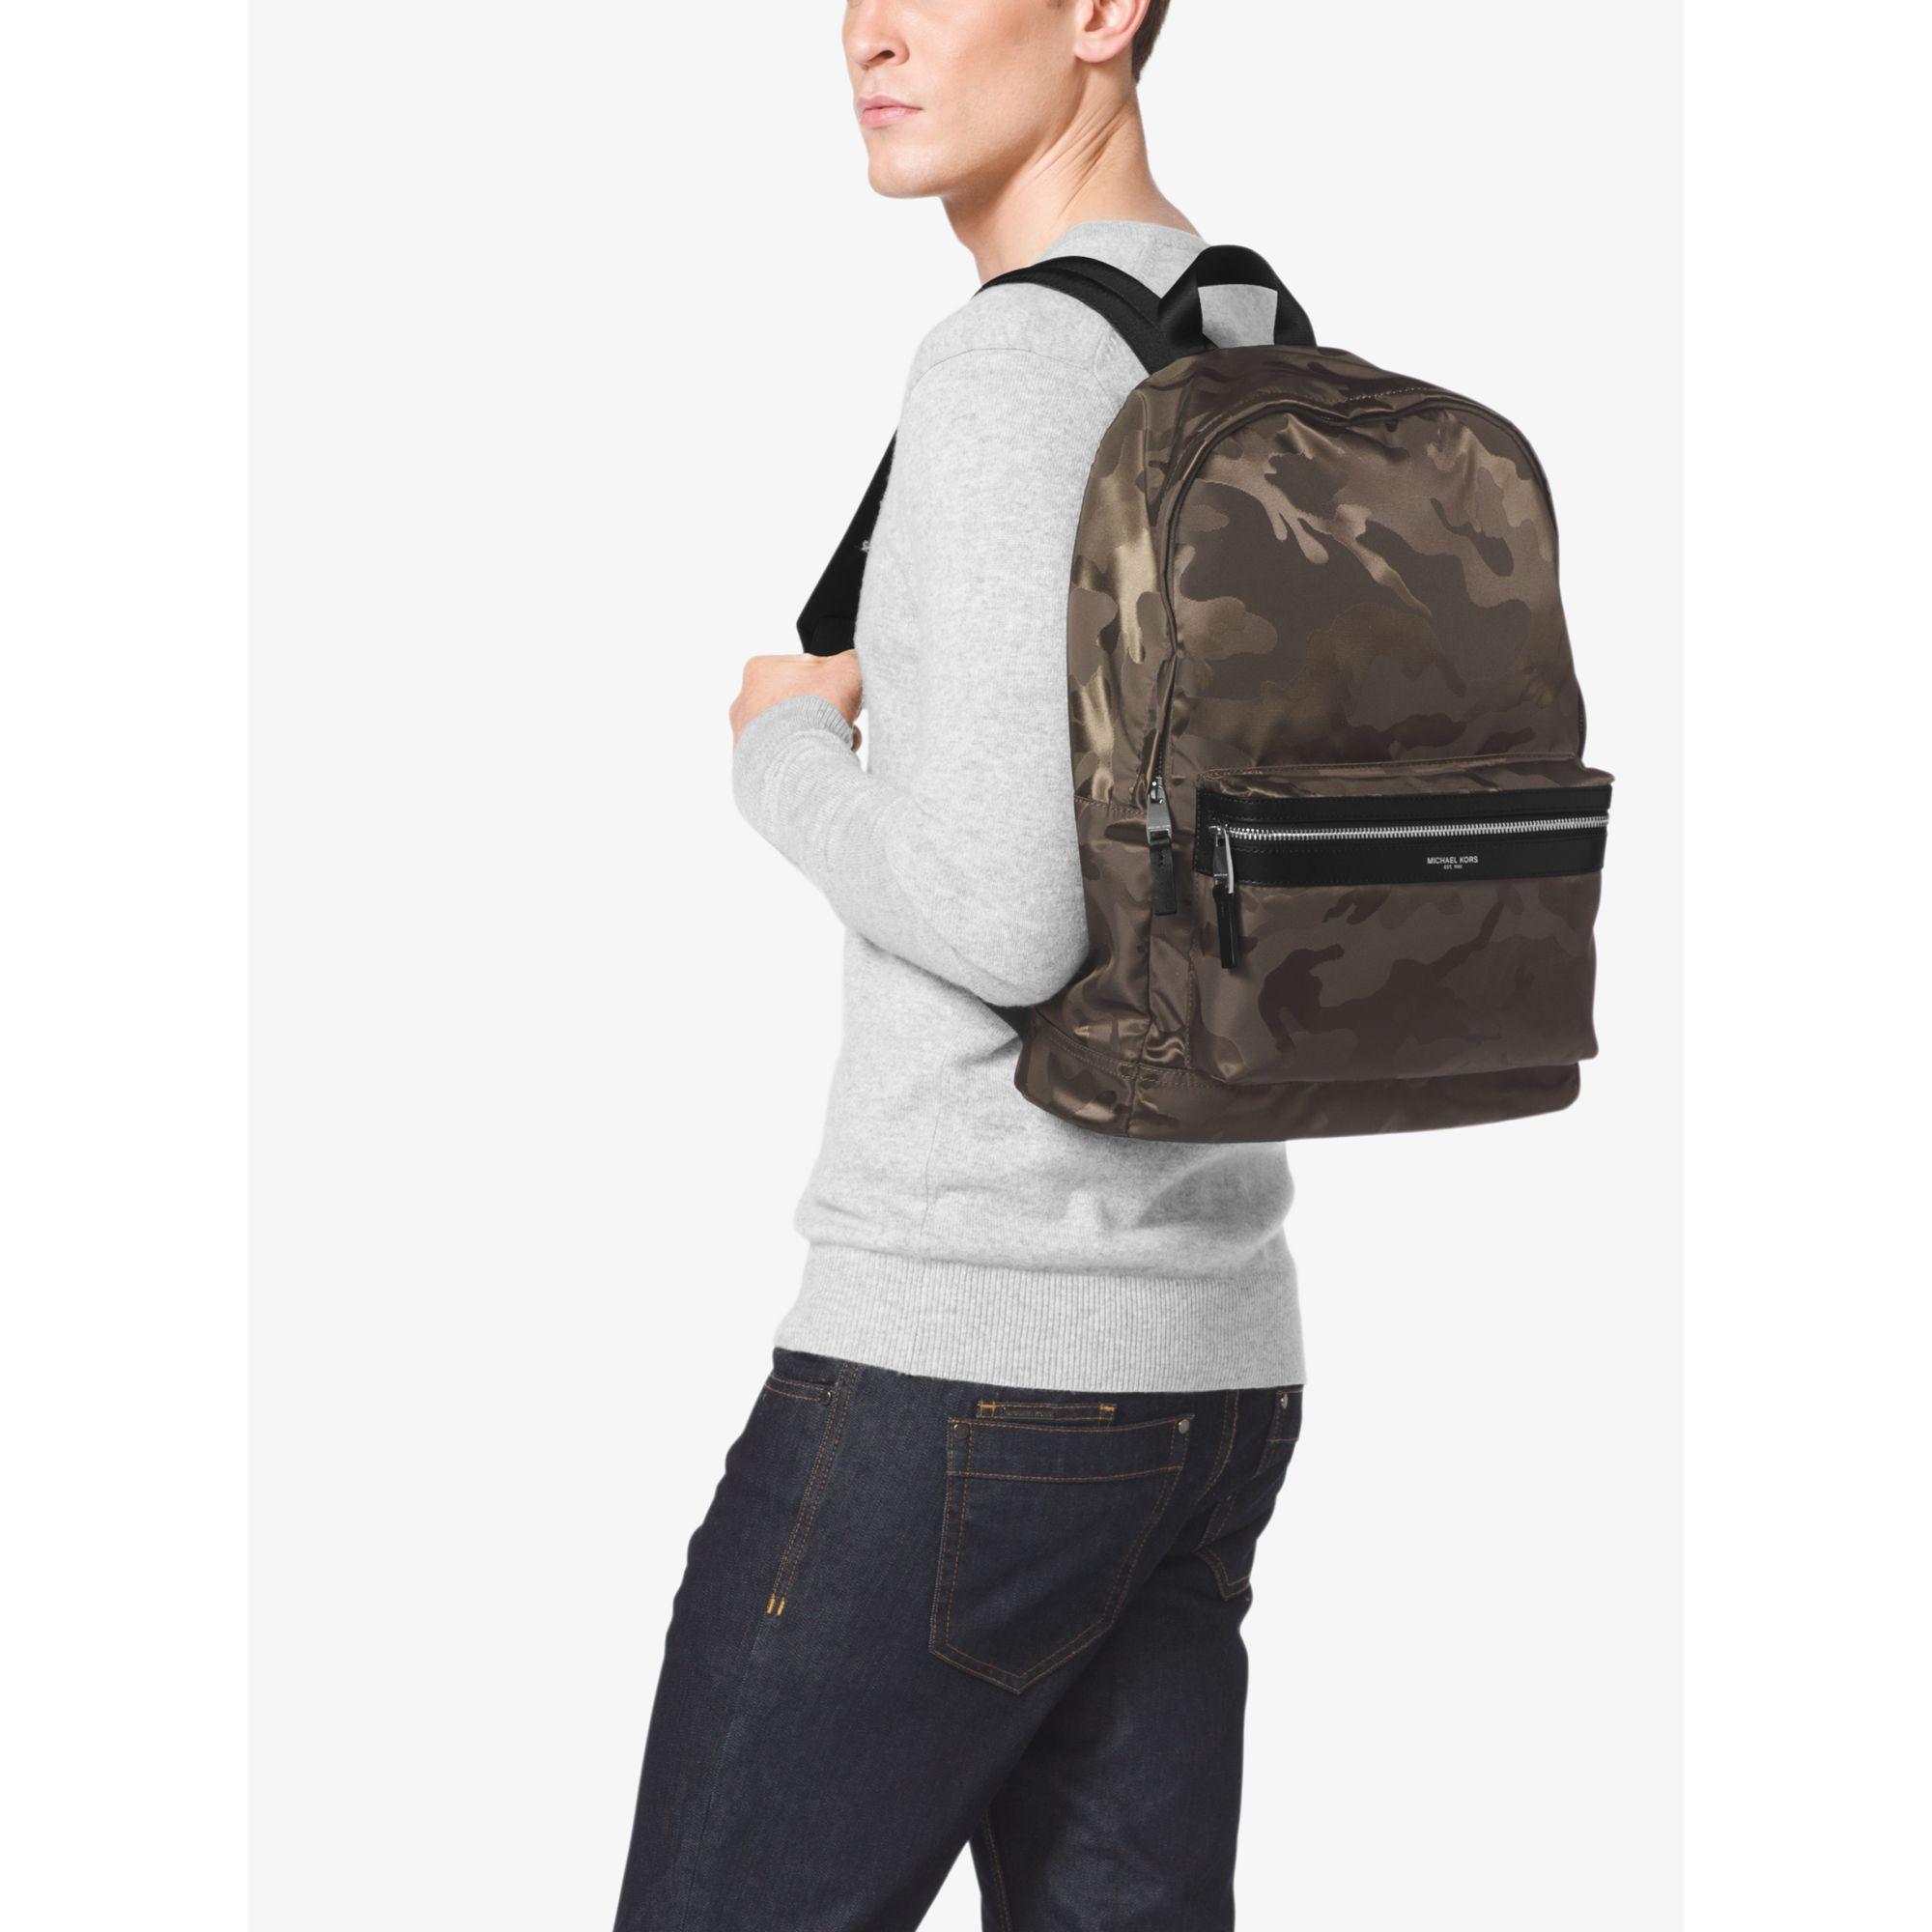 e9785ee72cb3 Michael Kors Kent Camouflage Nylon Jacquard Backpack in Green for ...